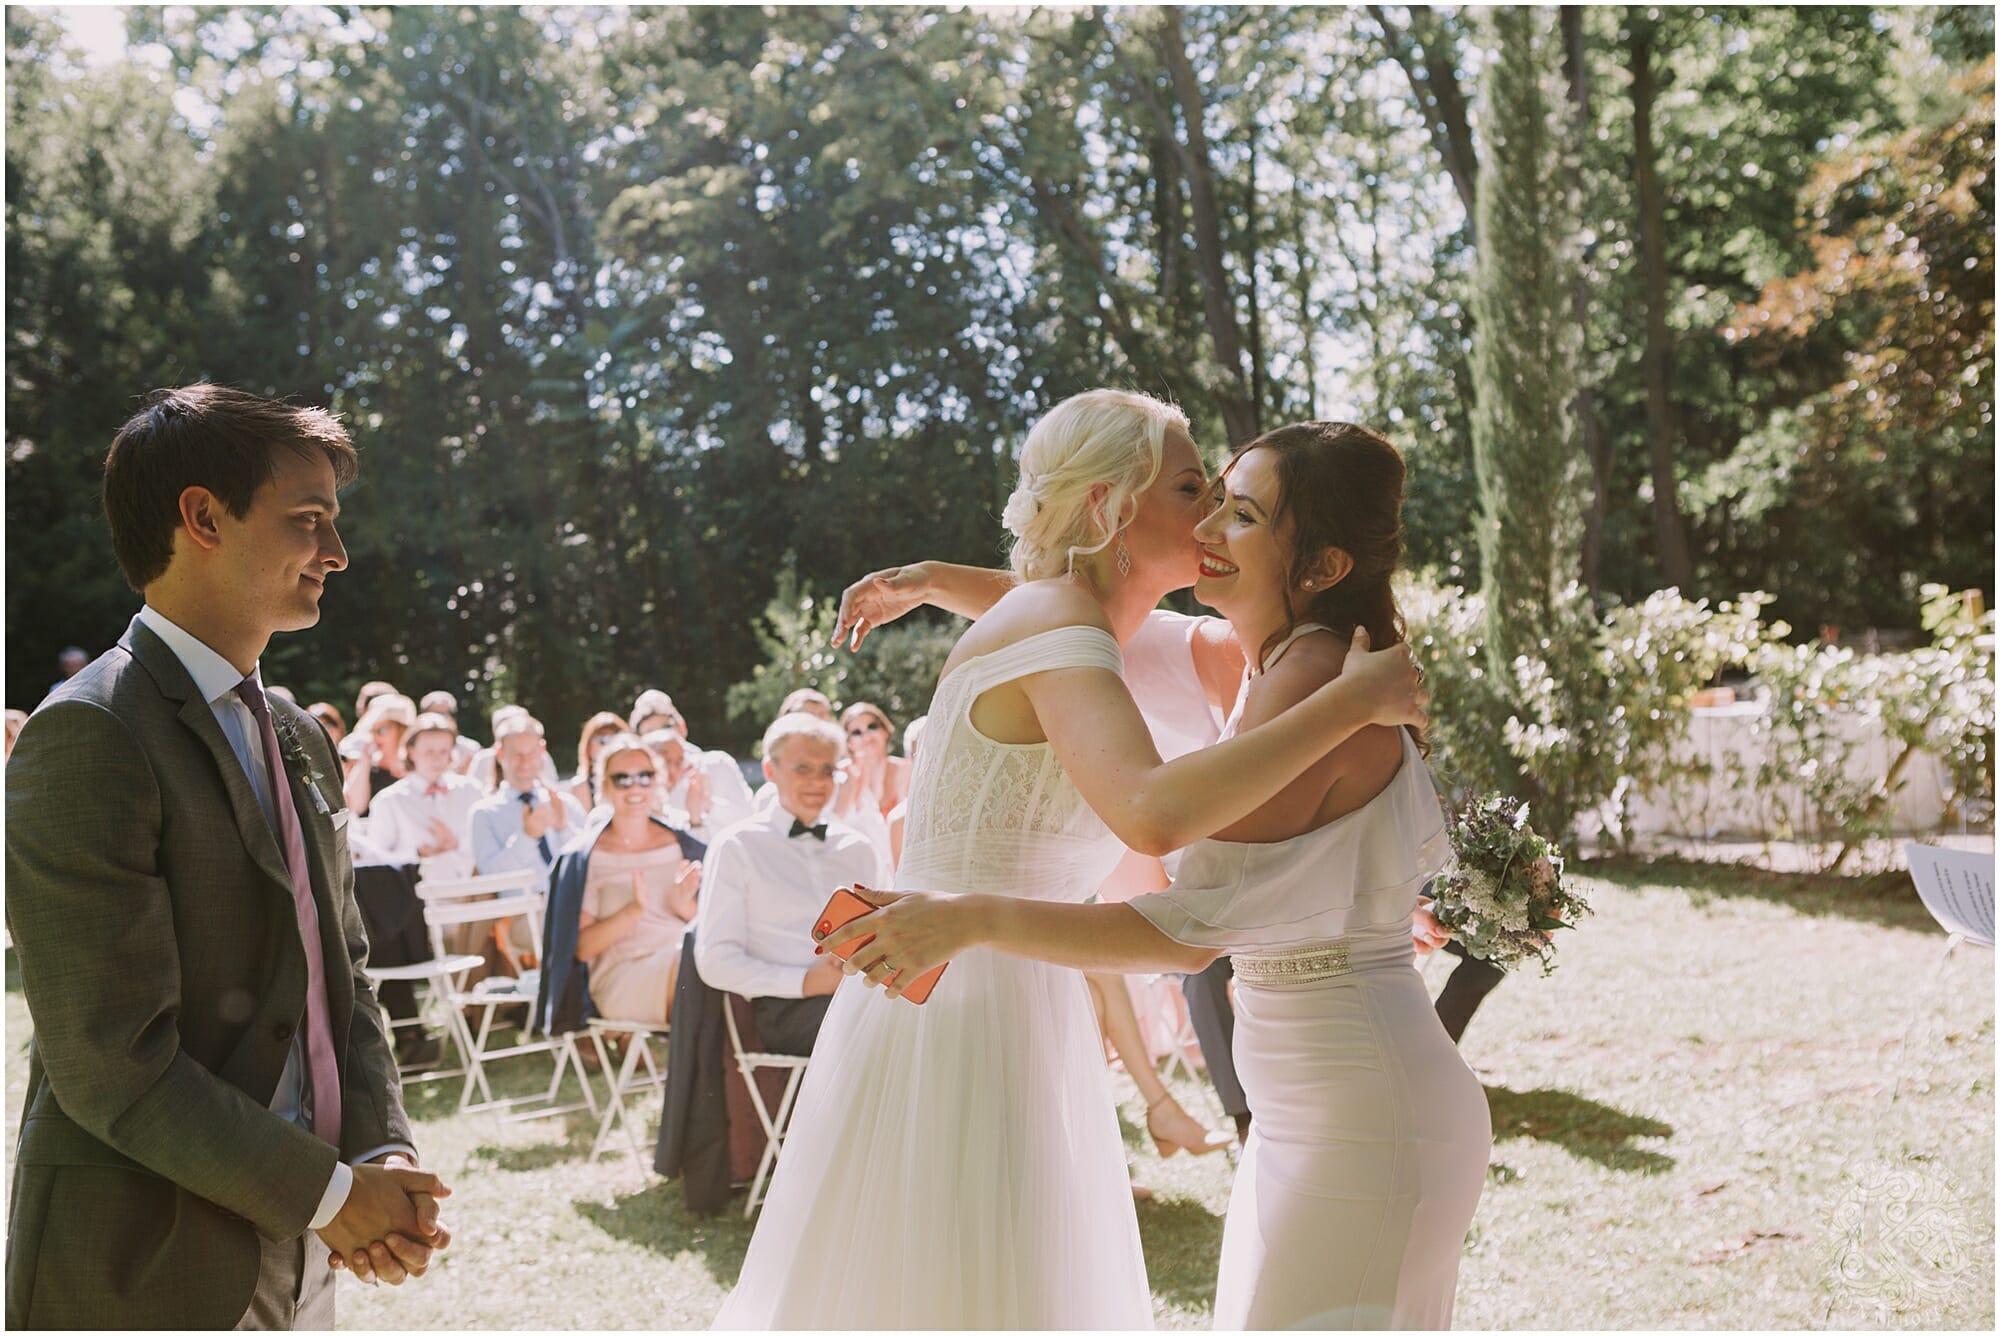 Kateryna-photos-photographe-mariage-chateau-des-3-fontaines-provence-avignon-vaucluse-sud_0043.jpg